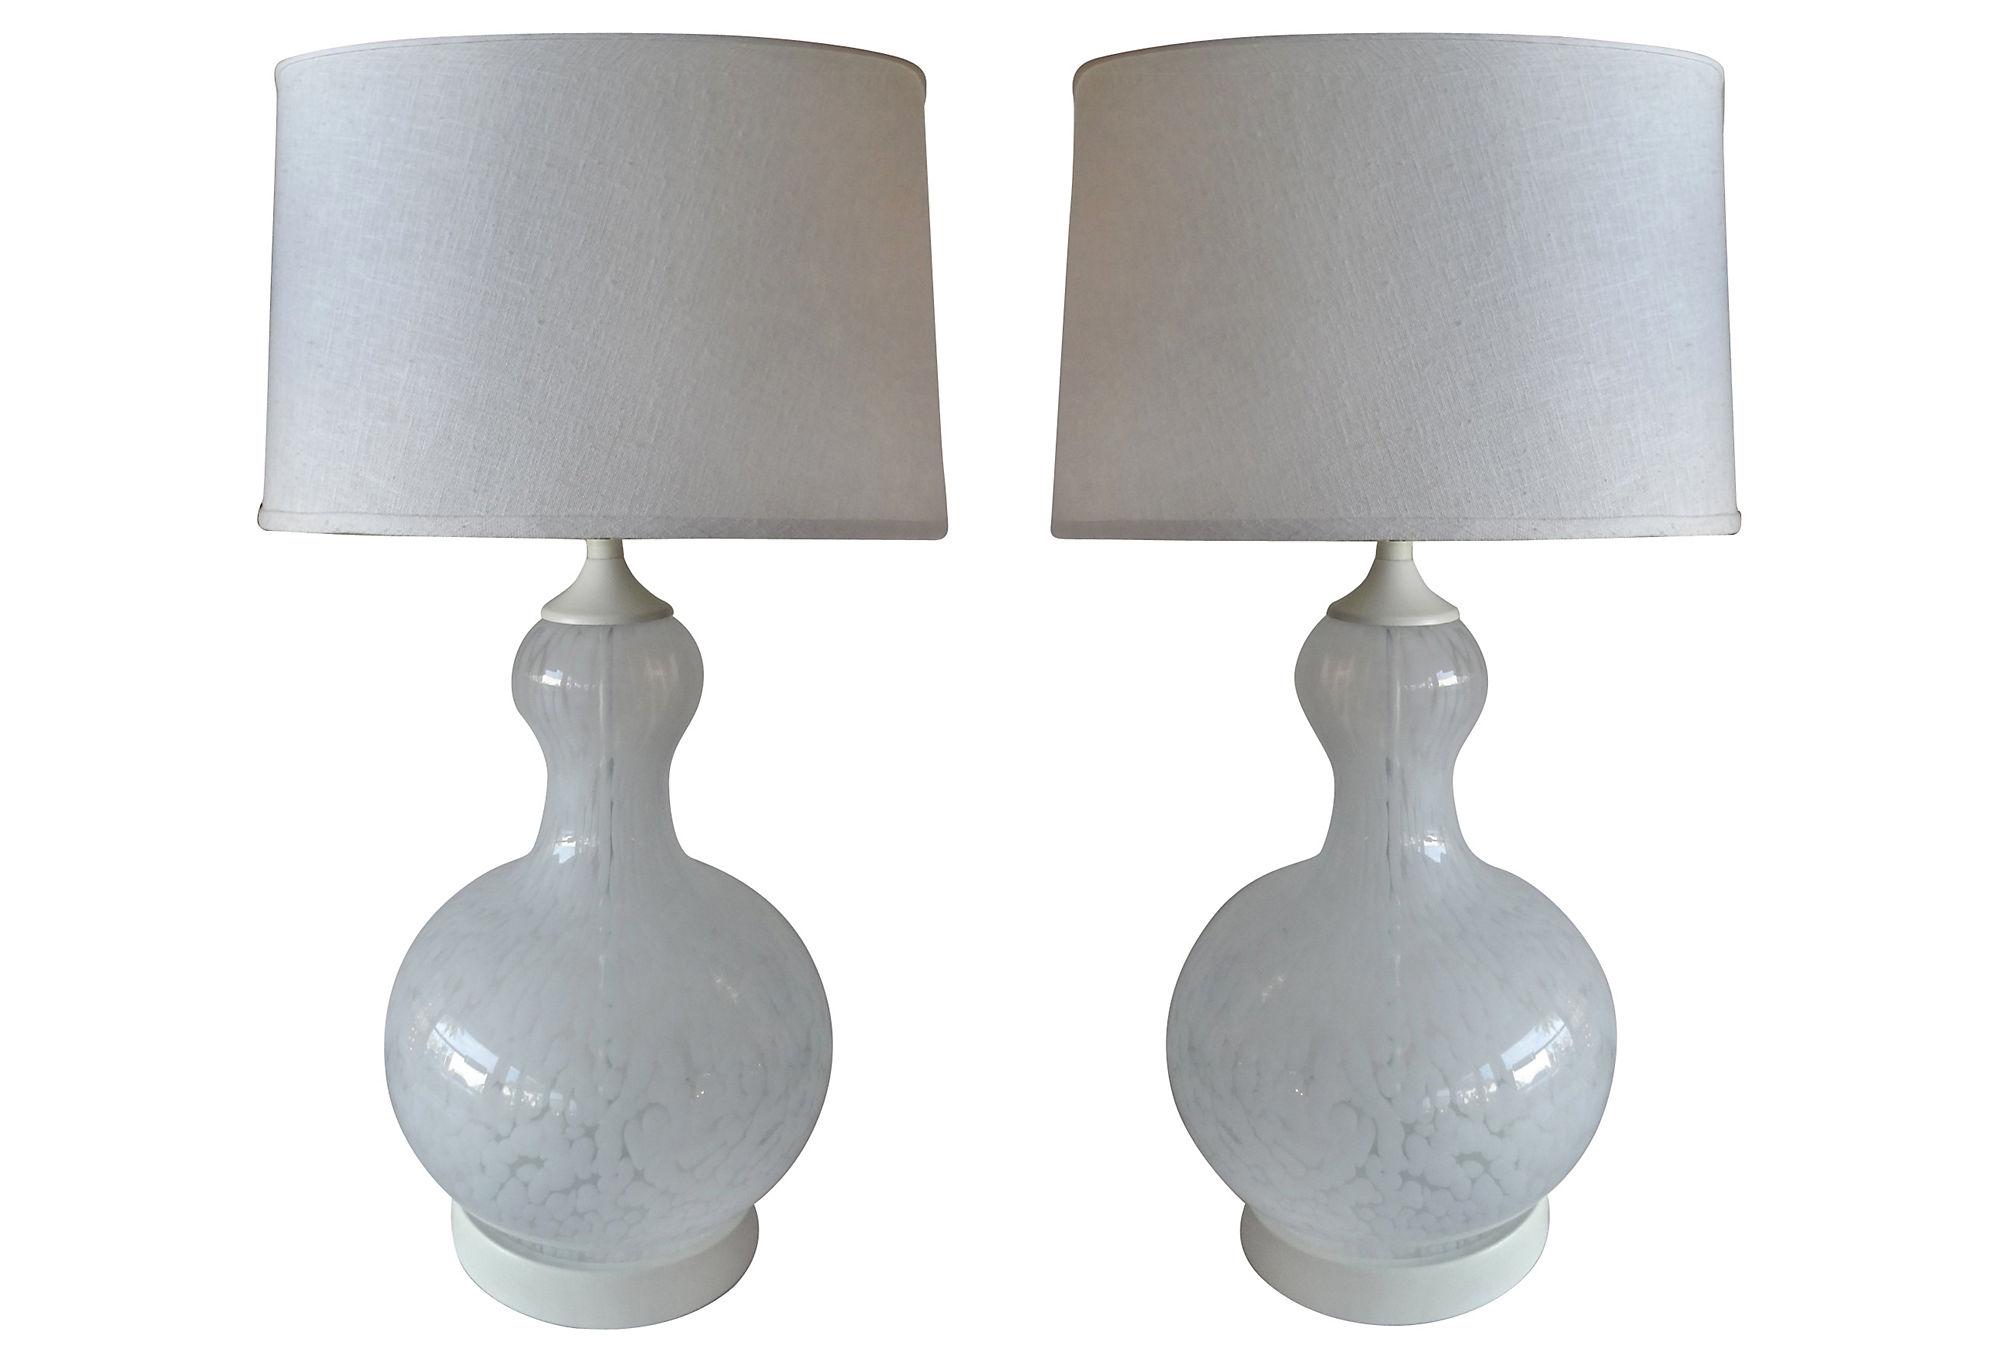 Pair Of Mottled Murano Glass Table Lamps